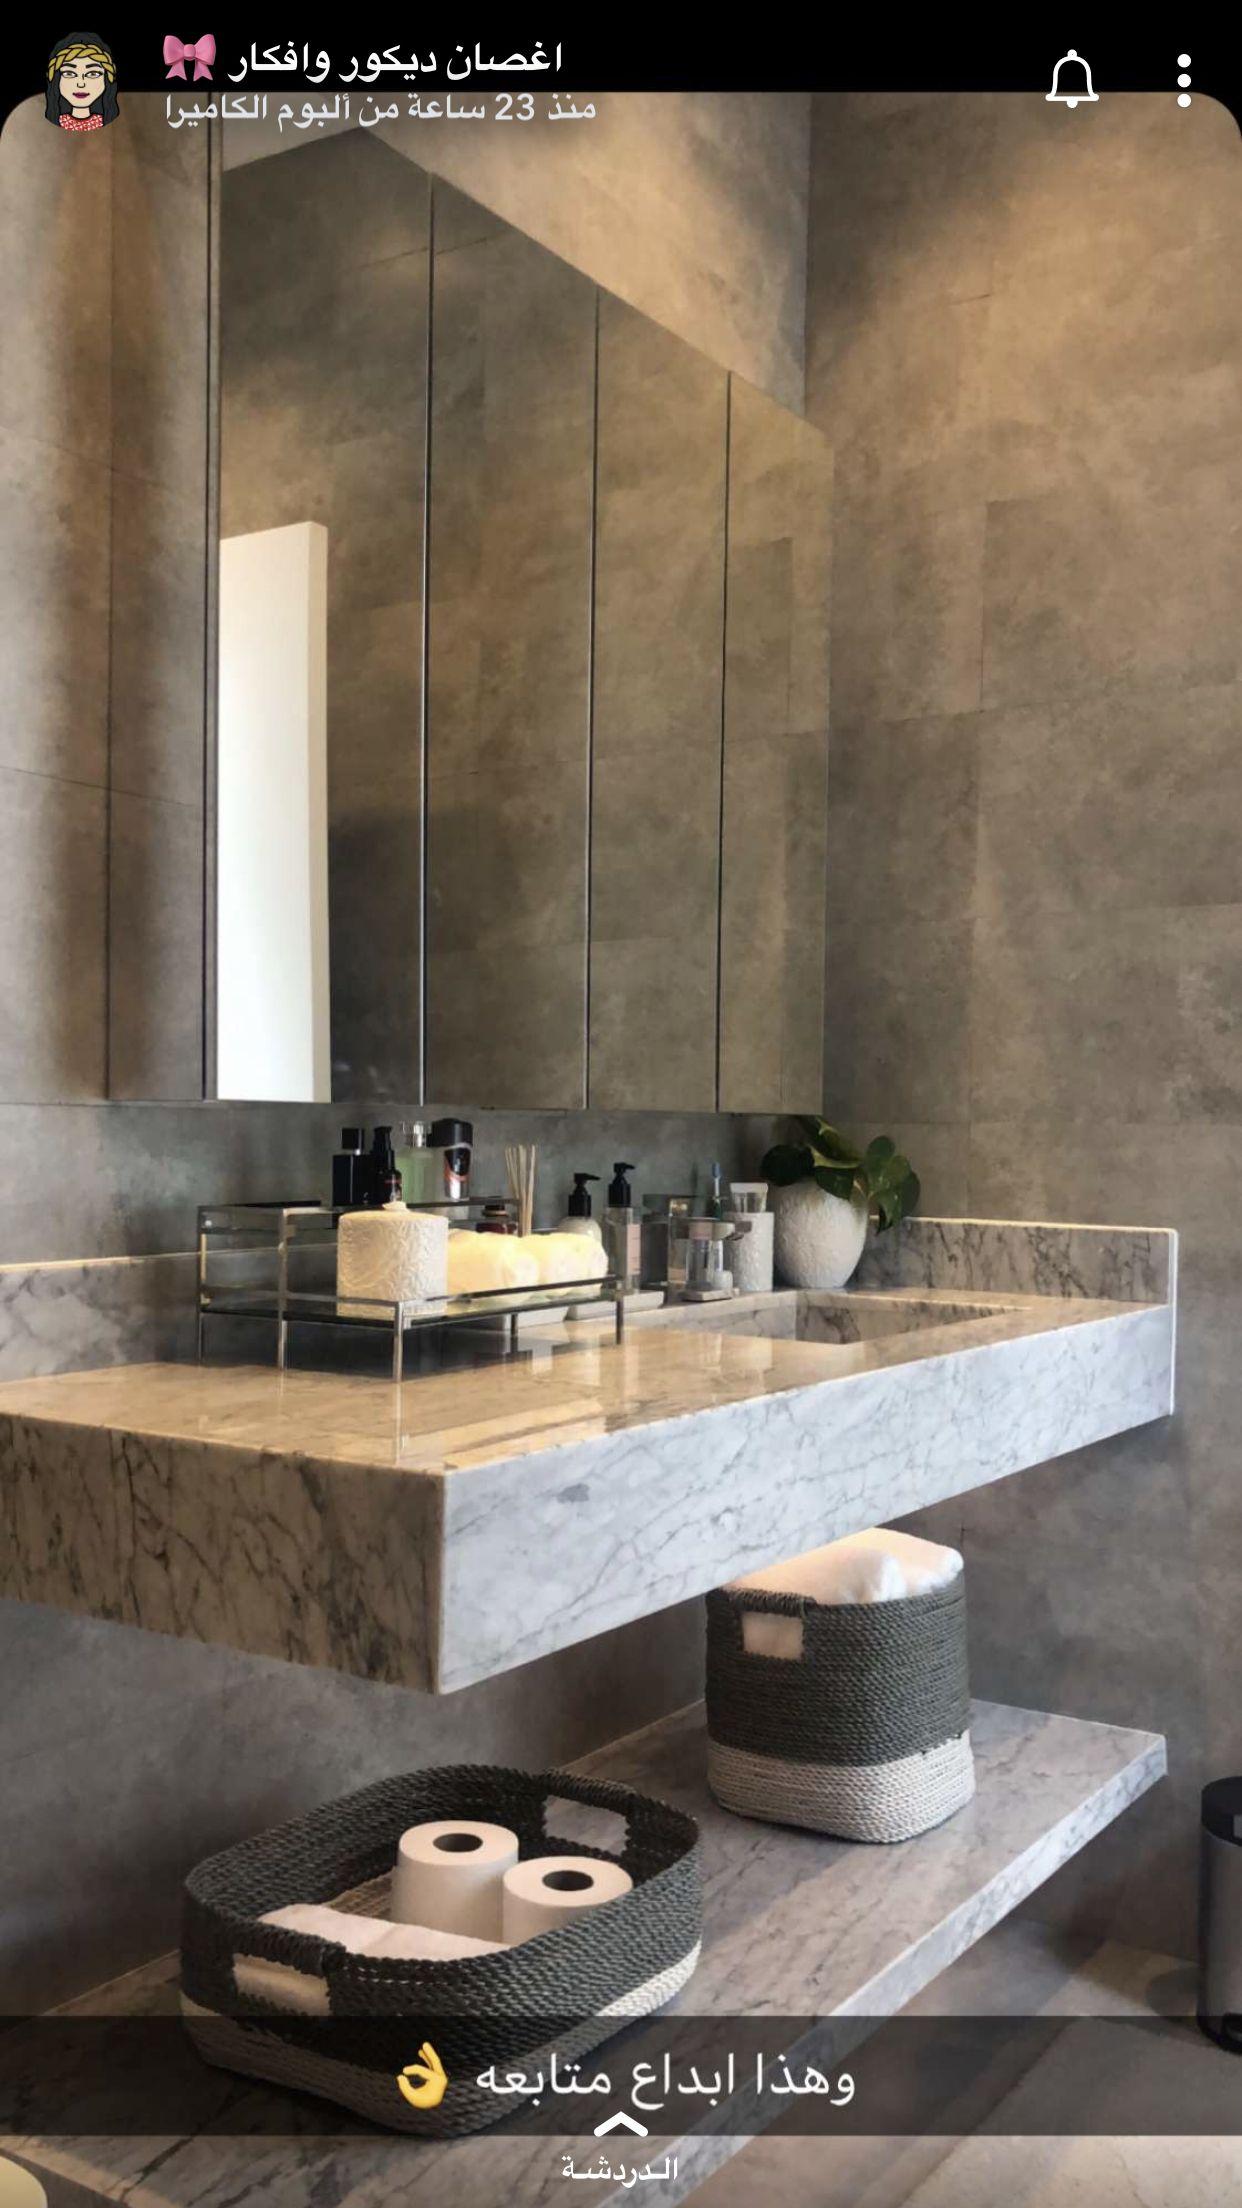 Pin By Ayat Mooha On حمامات Bathroom Design Decor Casual Home Decor Bathroom Design Luxury